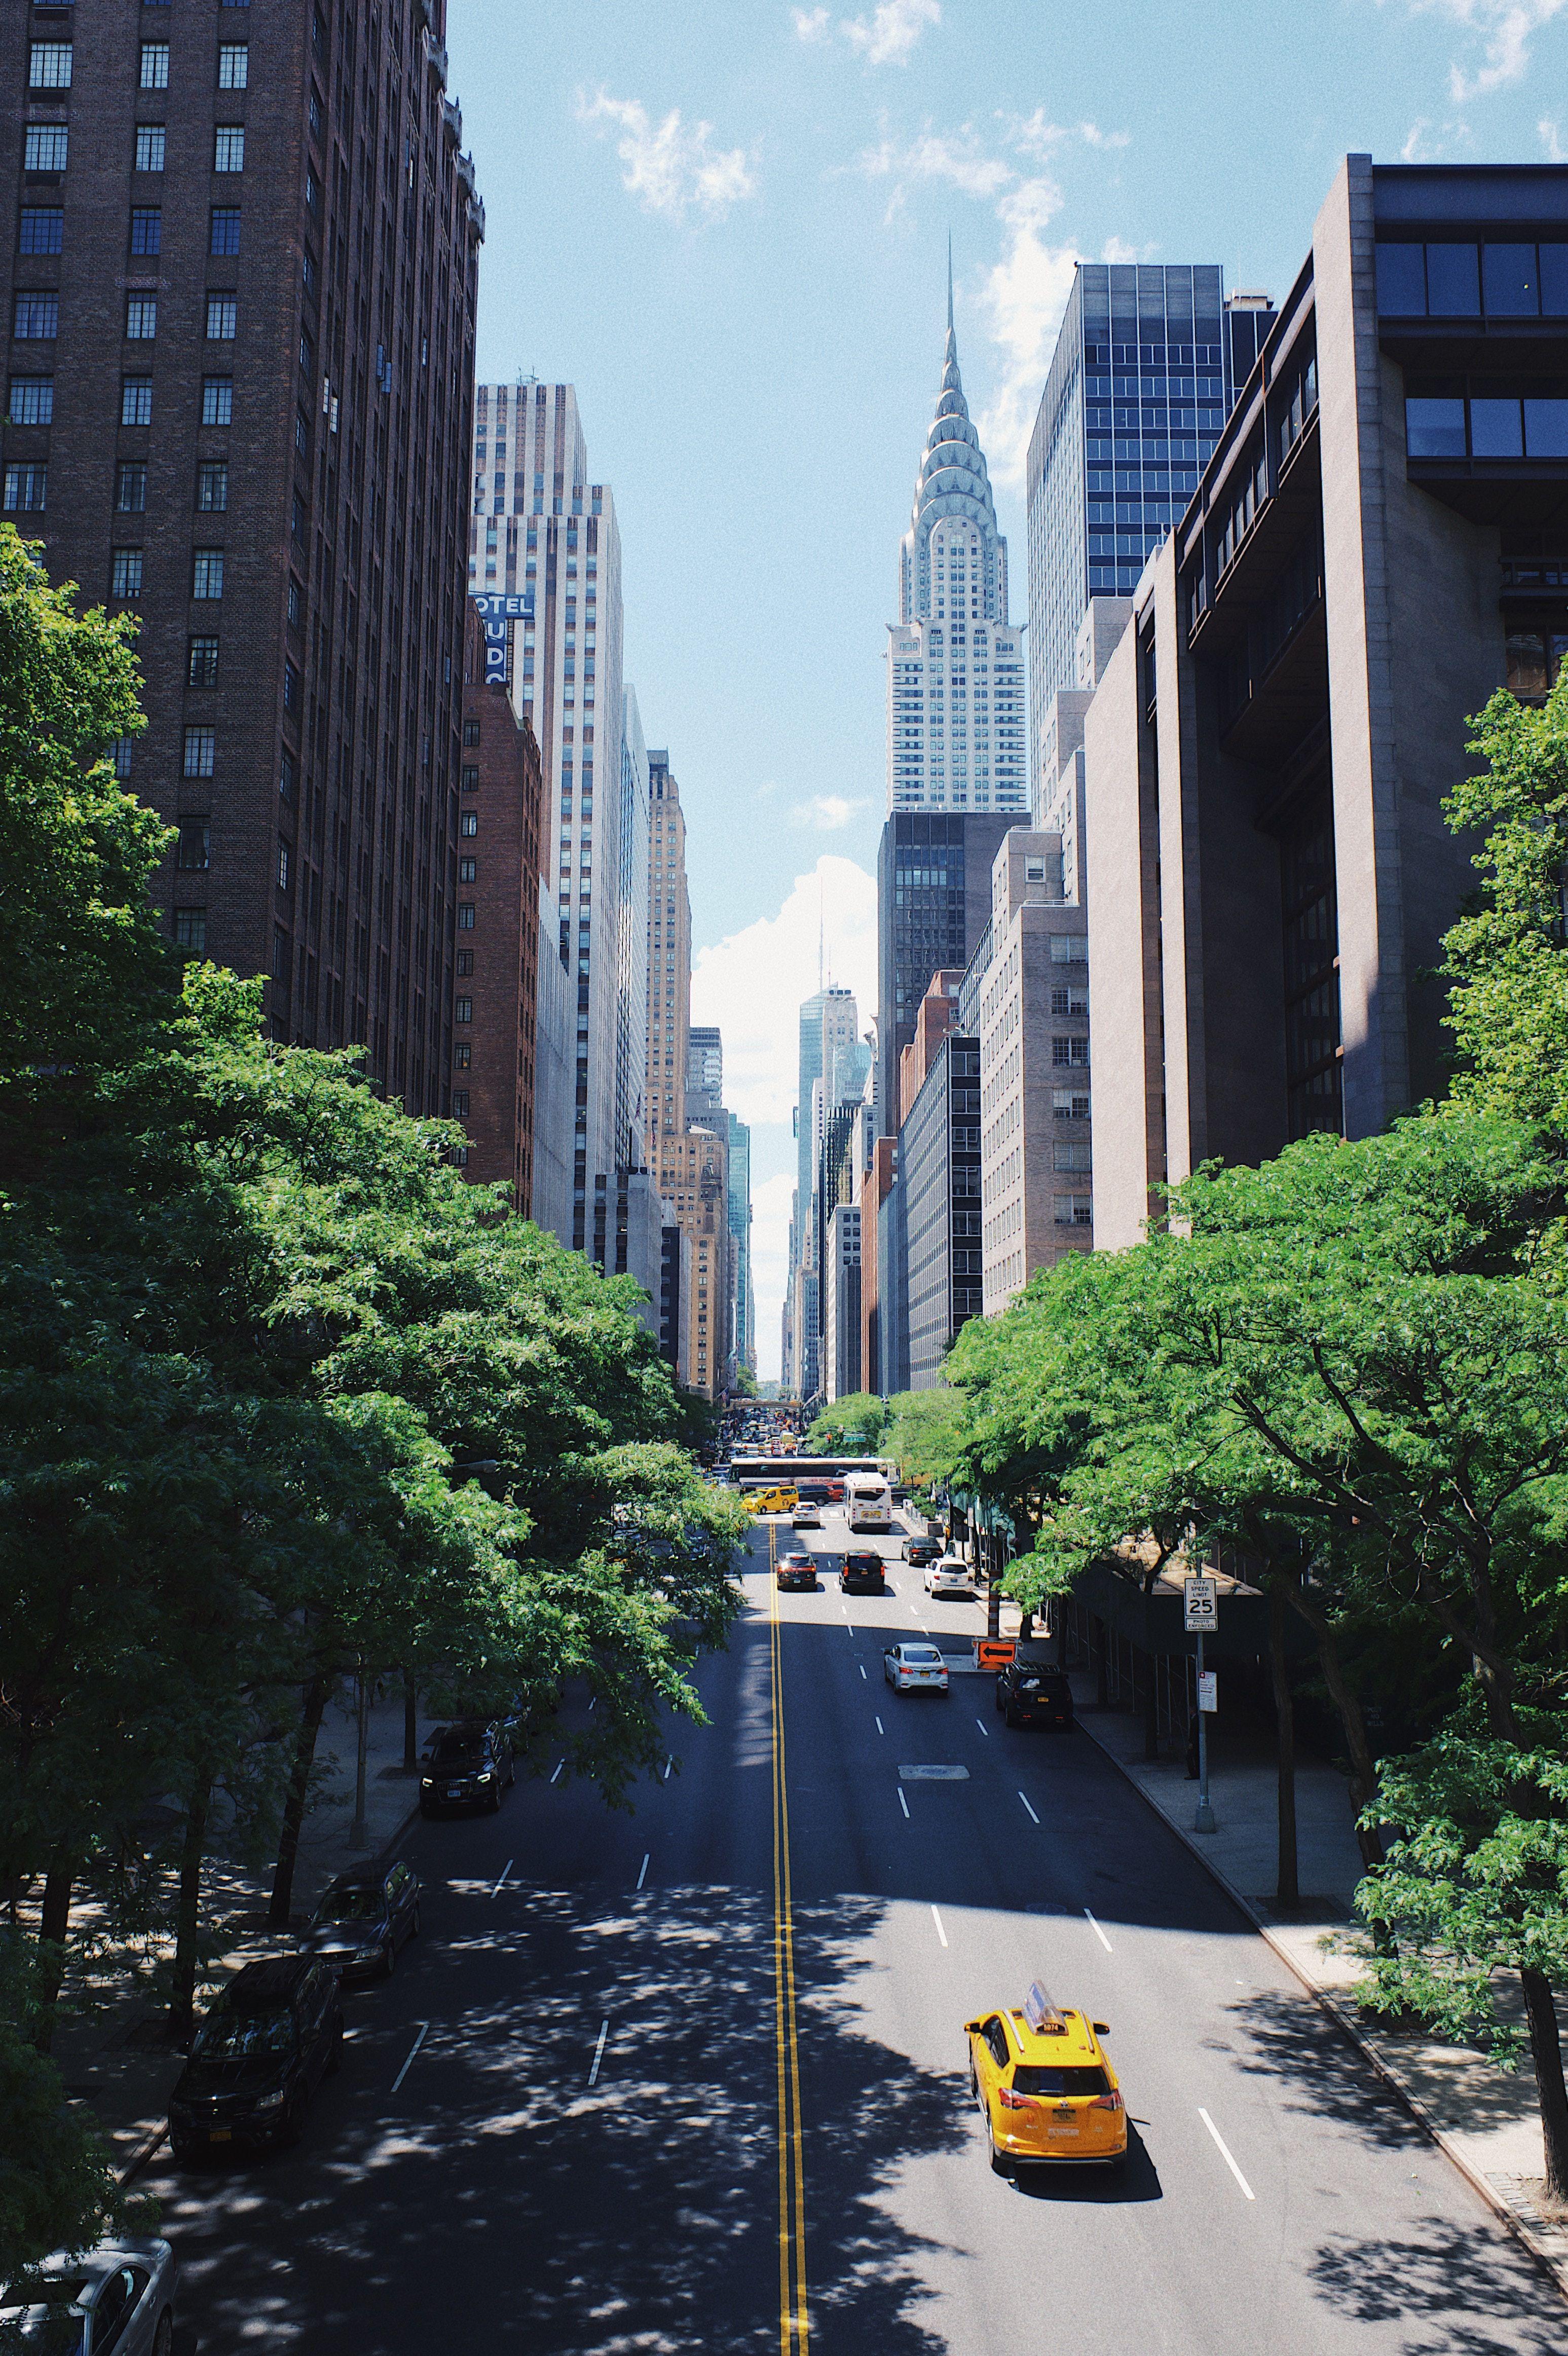 10 Most Expensive New York City Neighborhoods